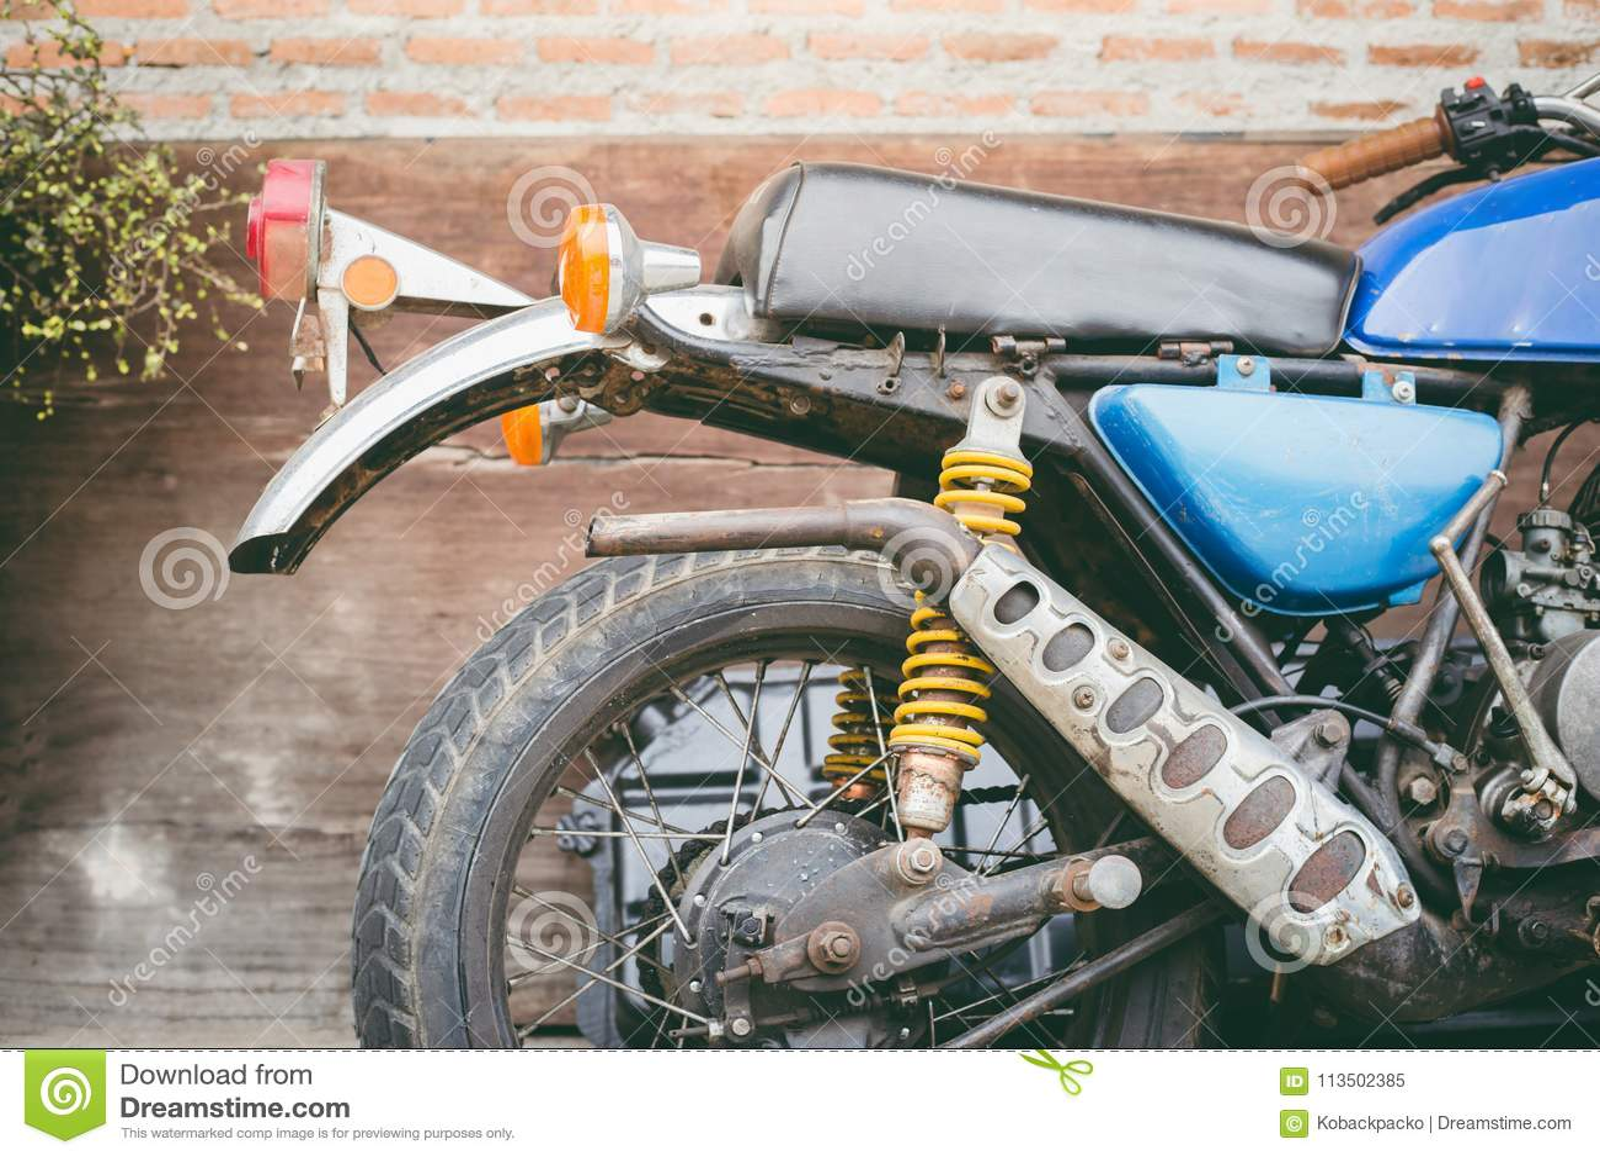 Motorbicycle